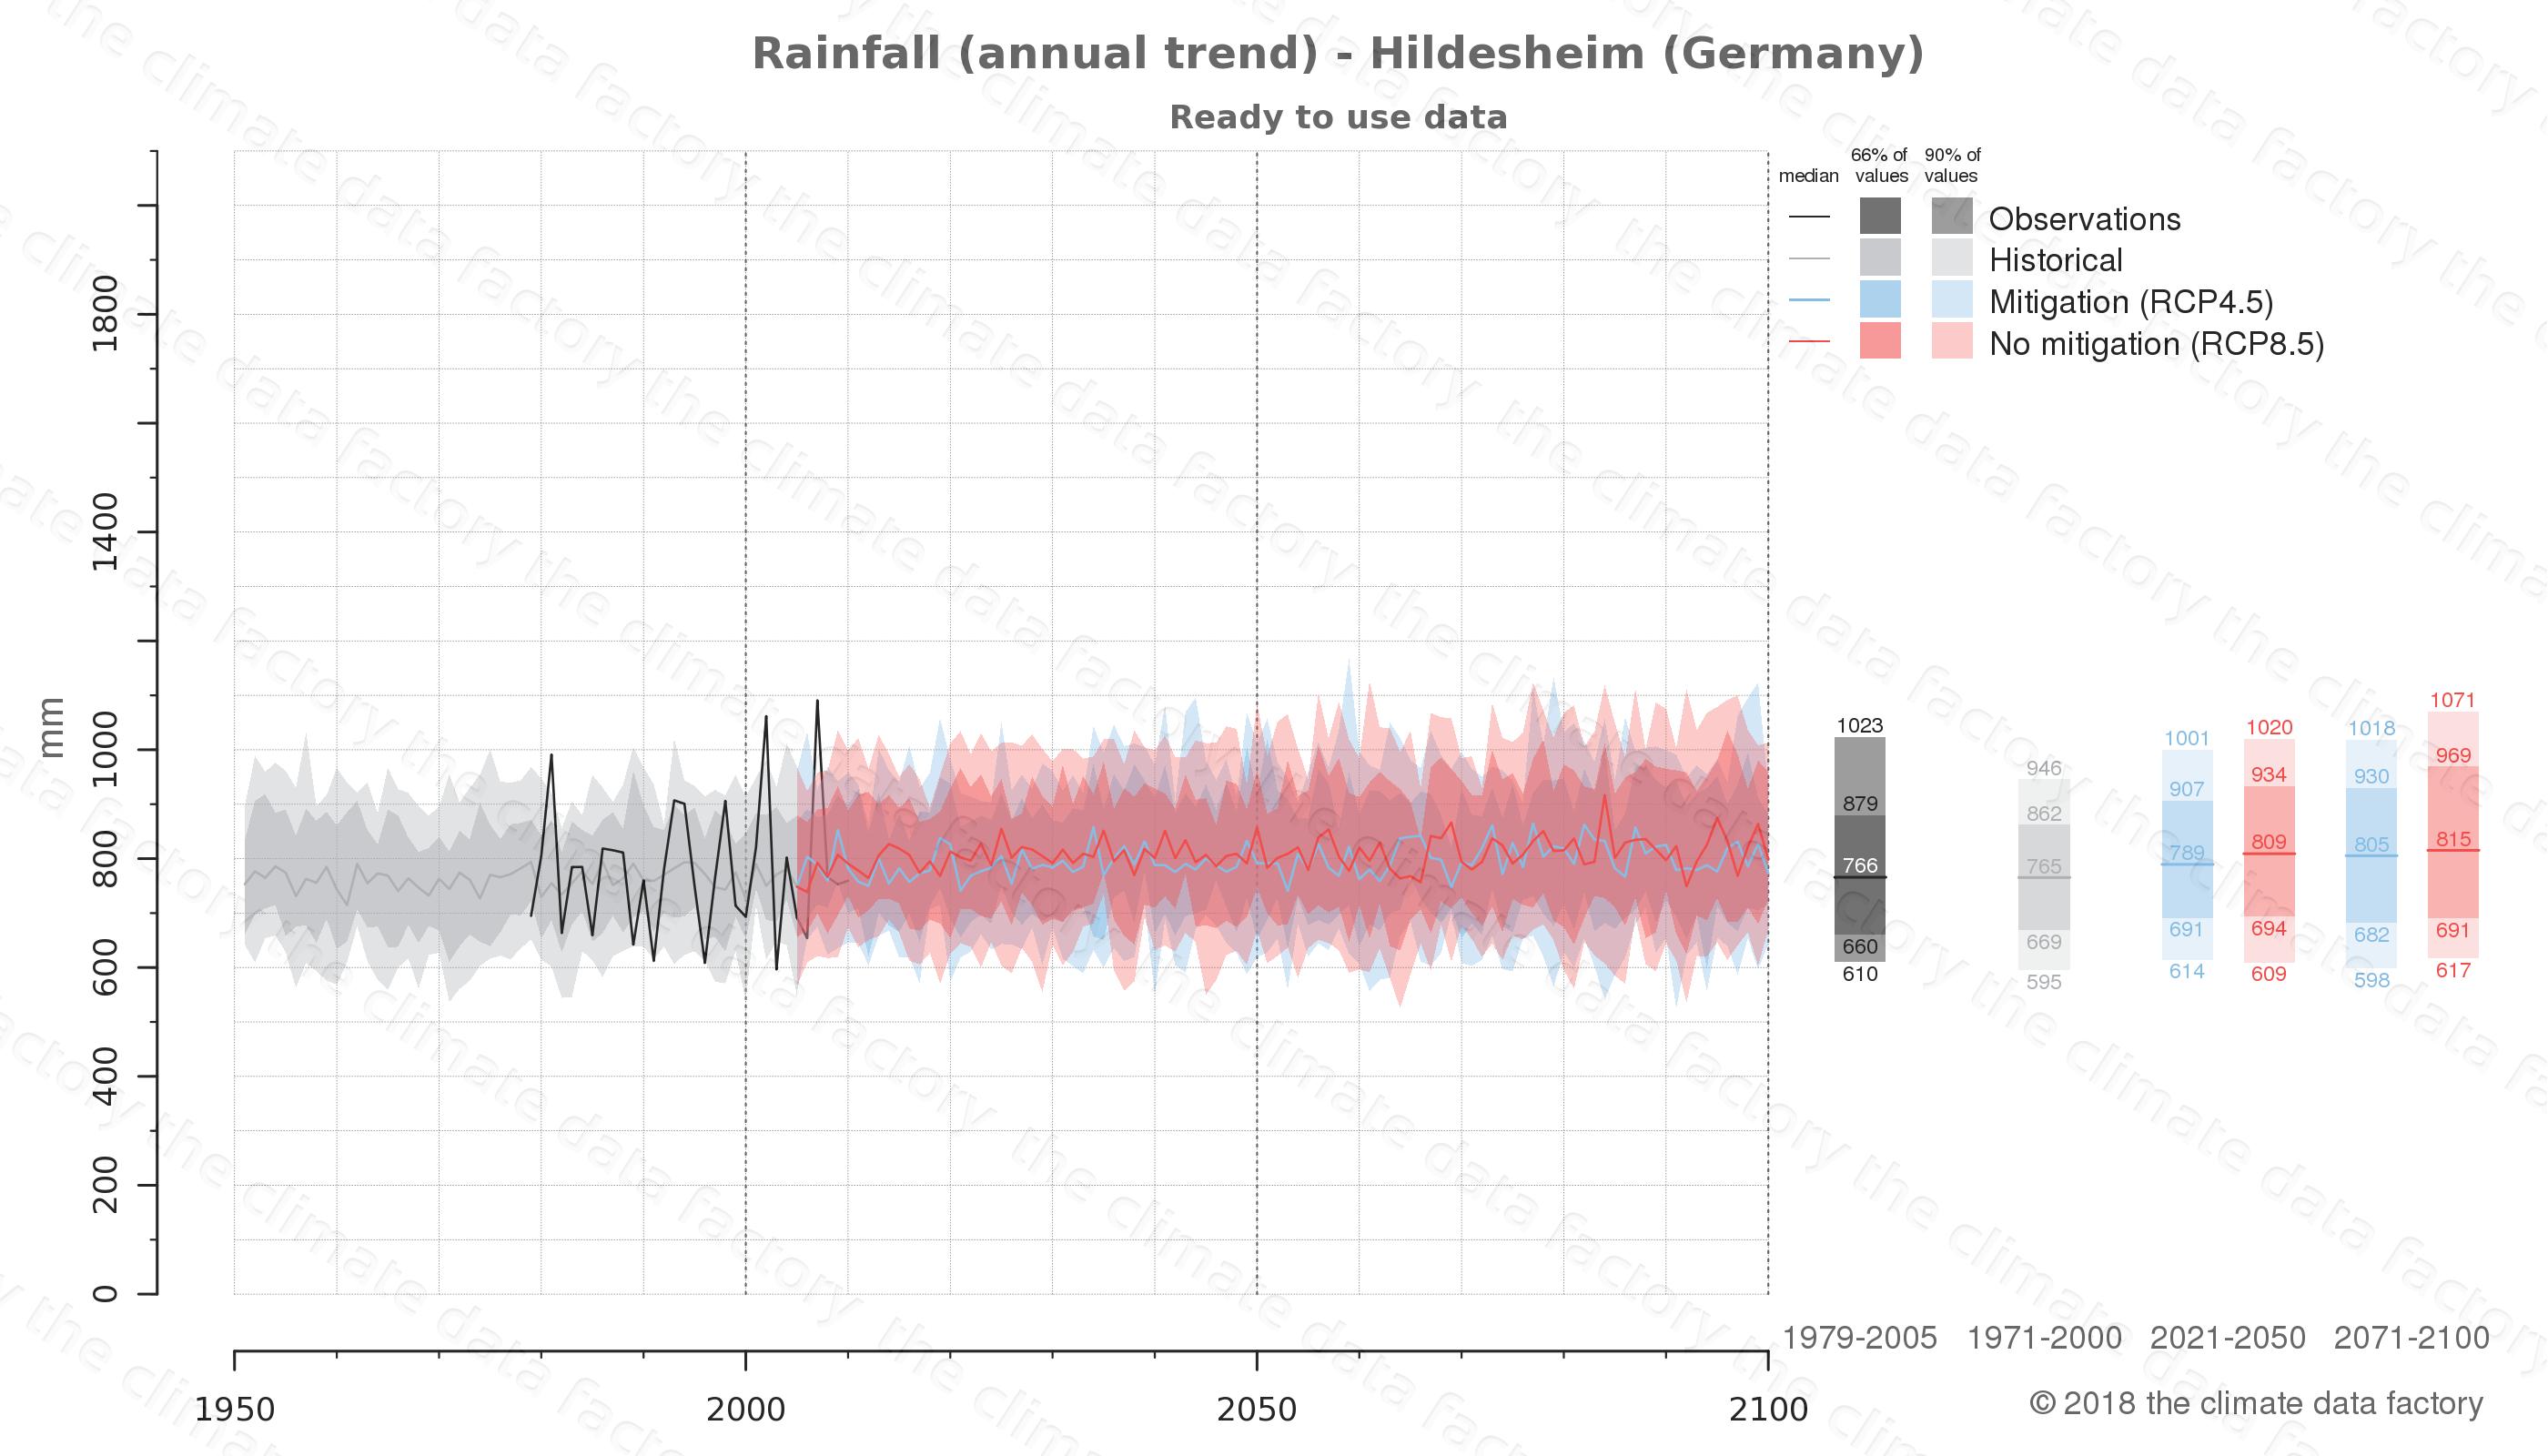 climate change data policy adaptation climate graph city data rainfall hildesheim germany